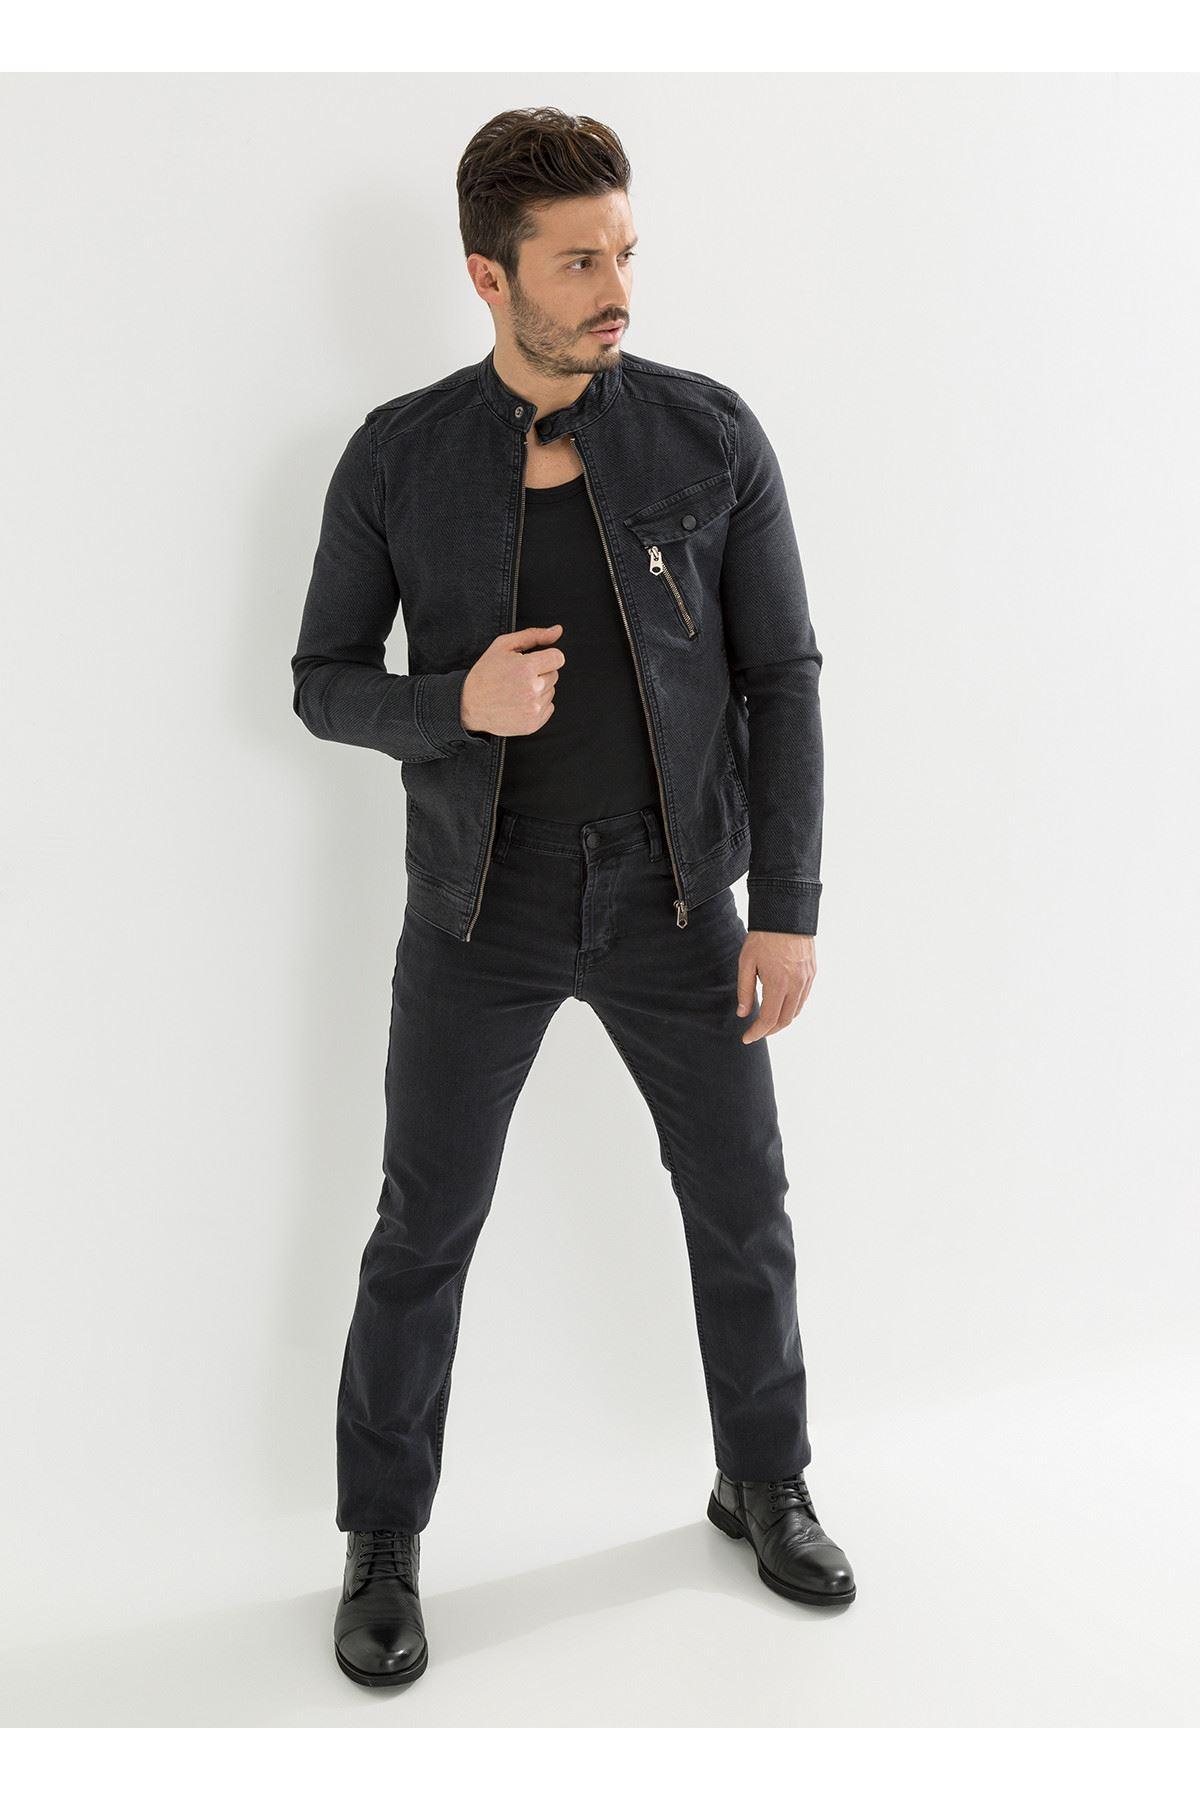 Siyah Örme Kumaş Erkek Kot Pantolon